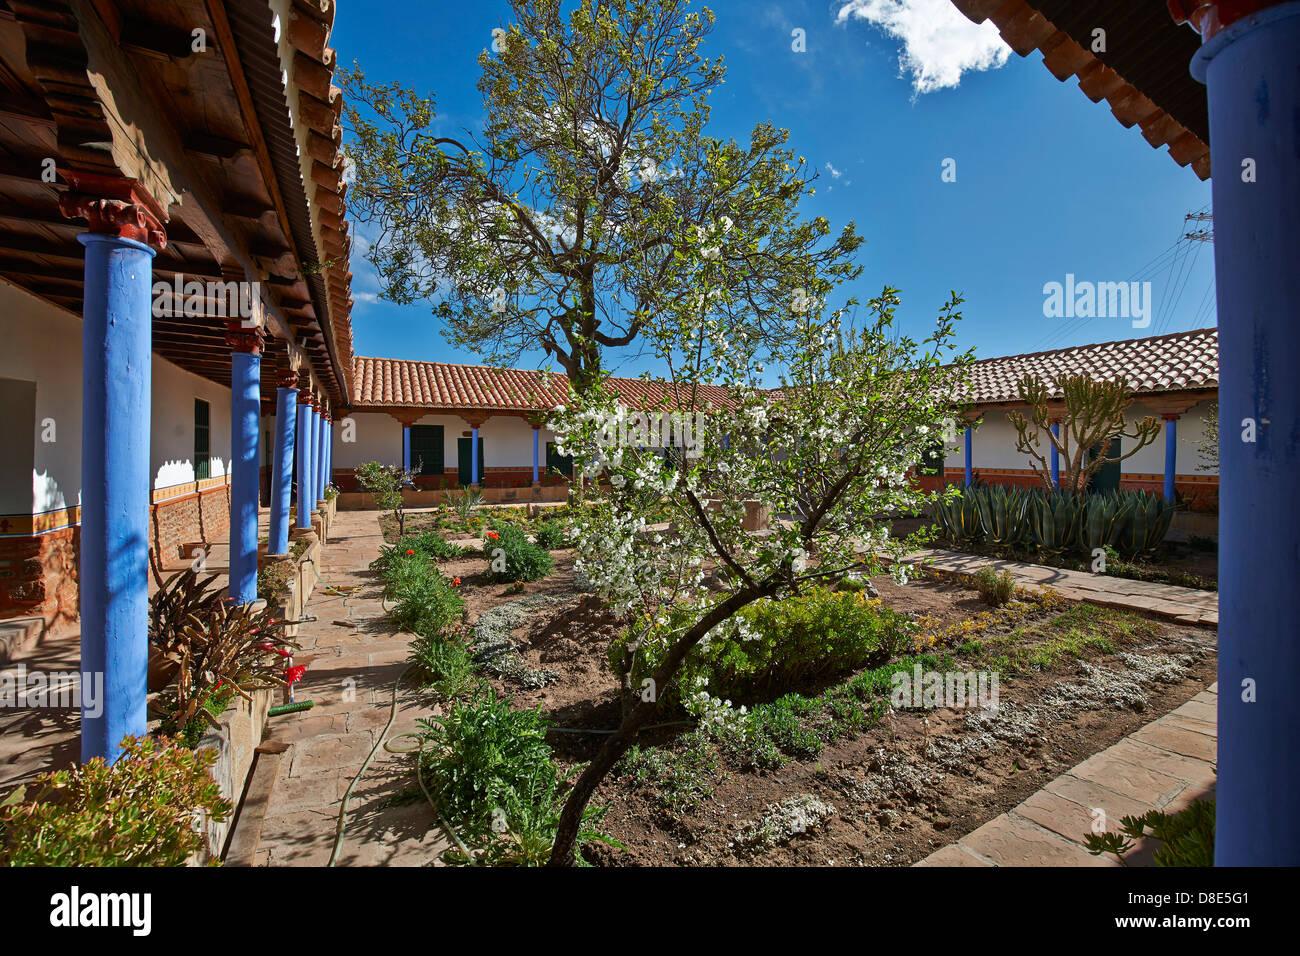 Atrium of the Convento de Santa Teresa, Potosi, Bolivia - Stock Image